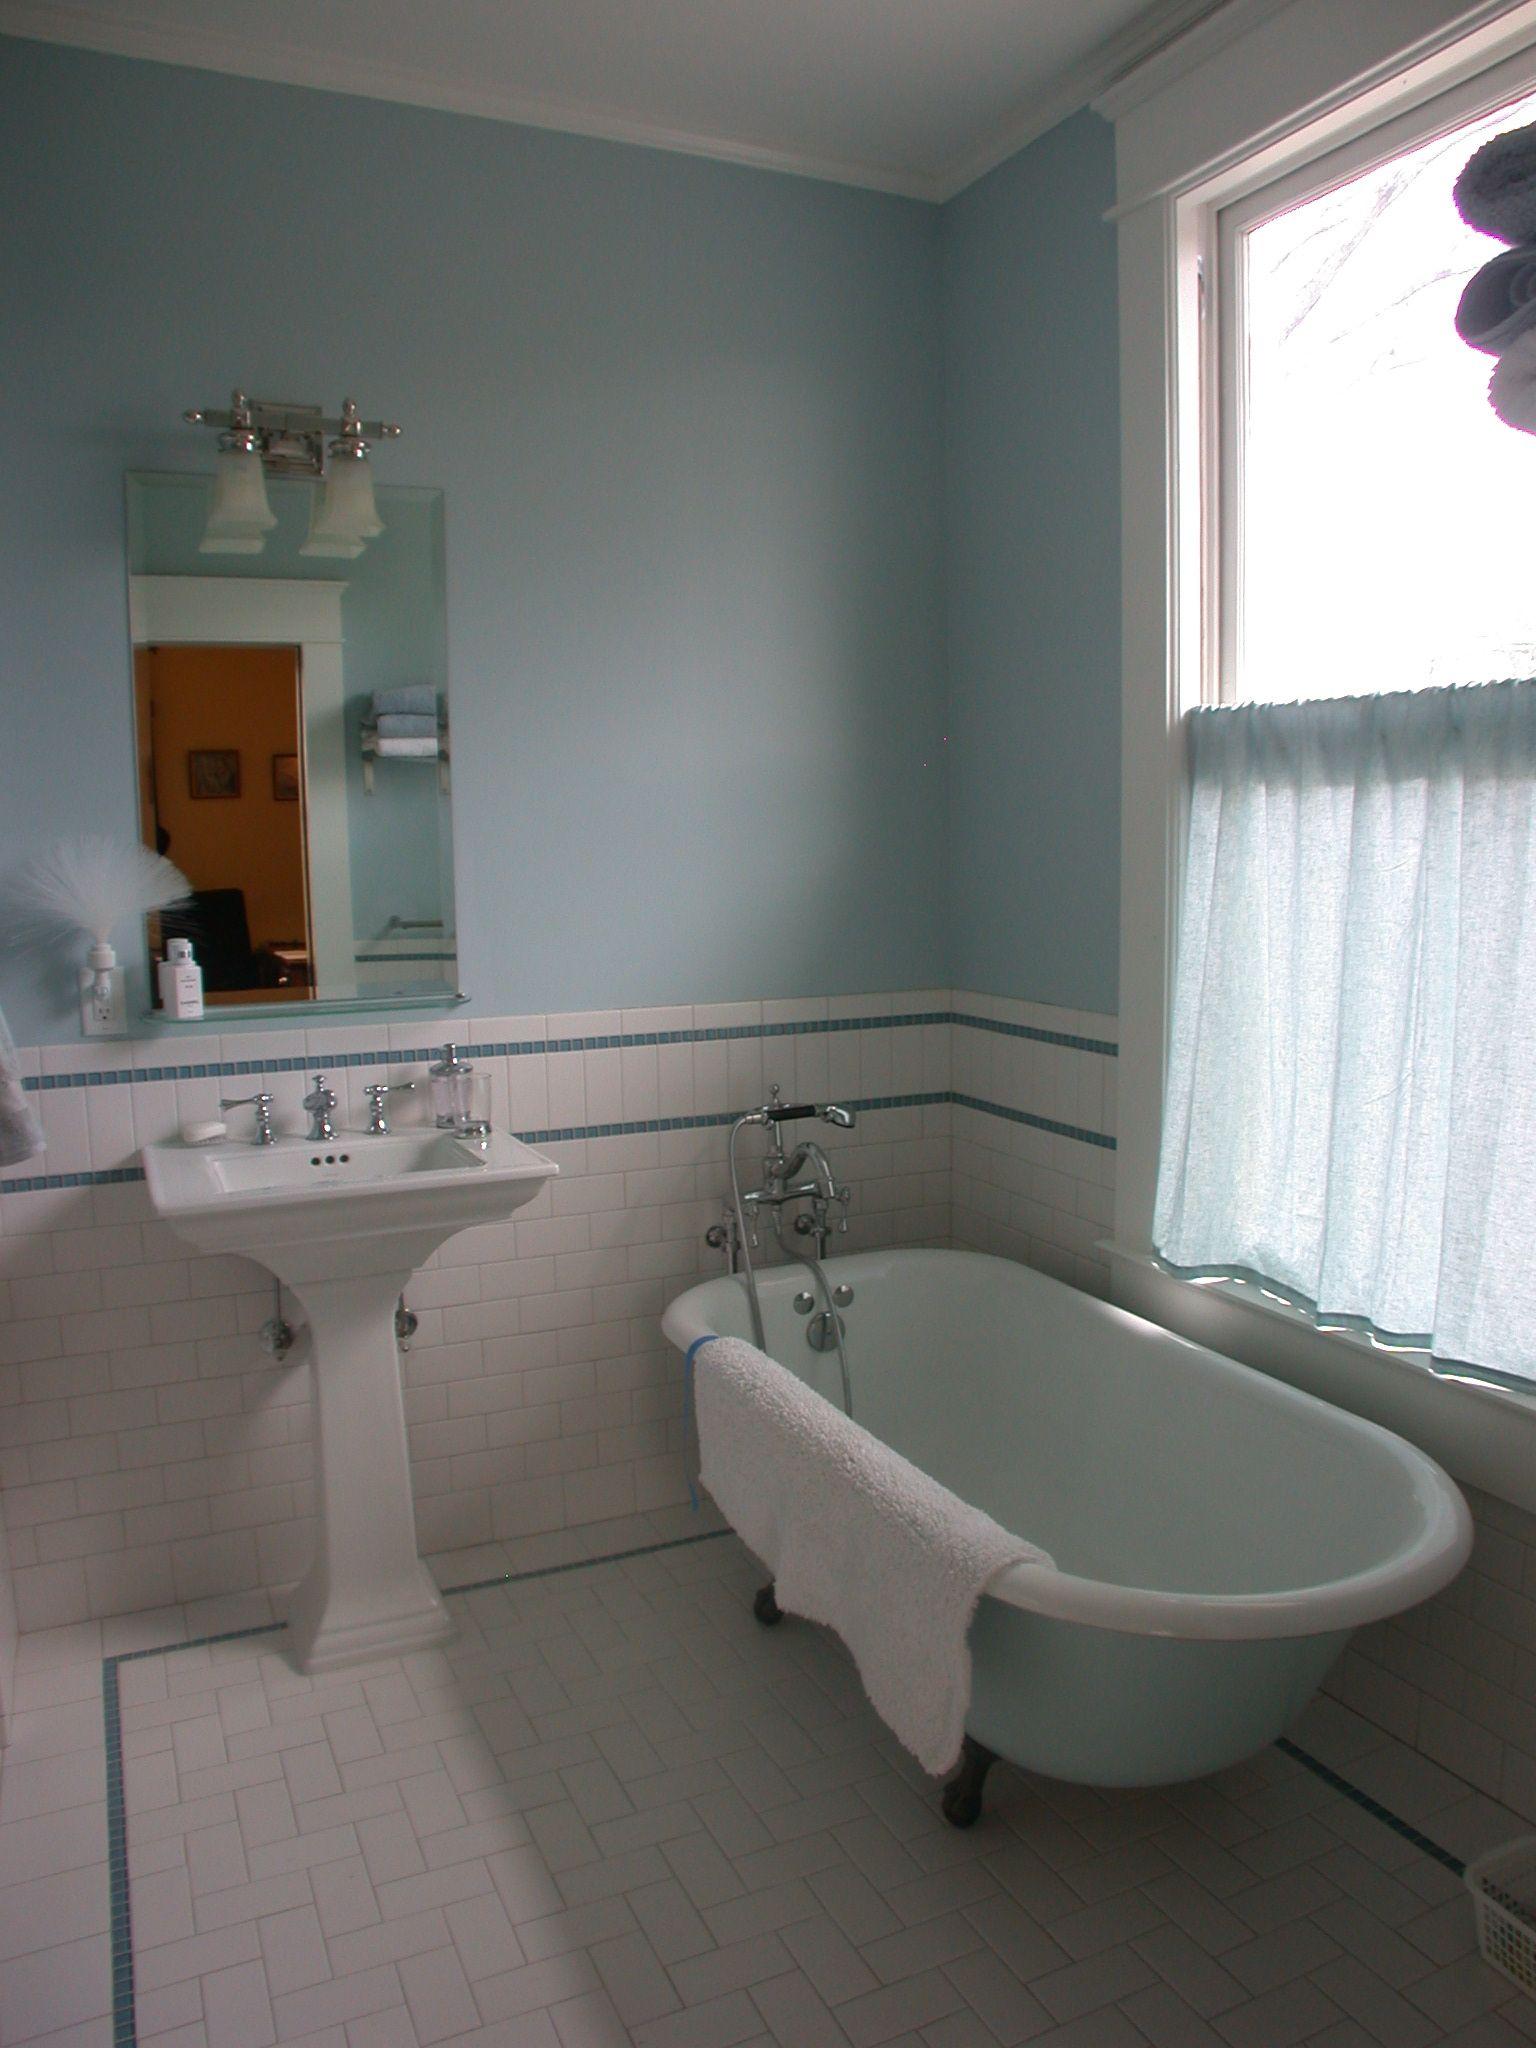 Subway tile wainscoting bathroom download shiifo